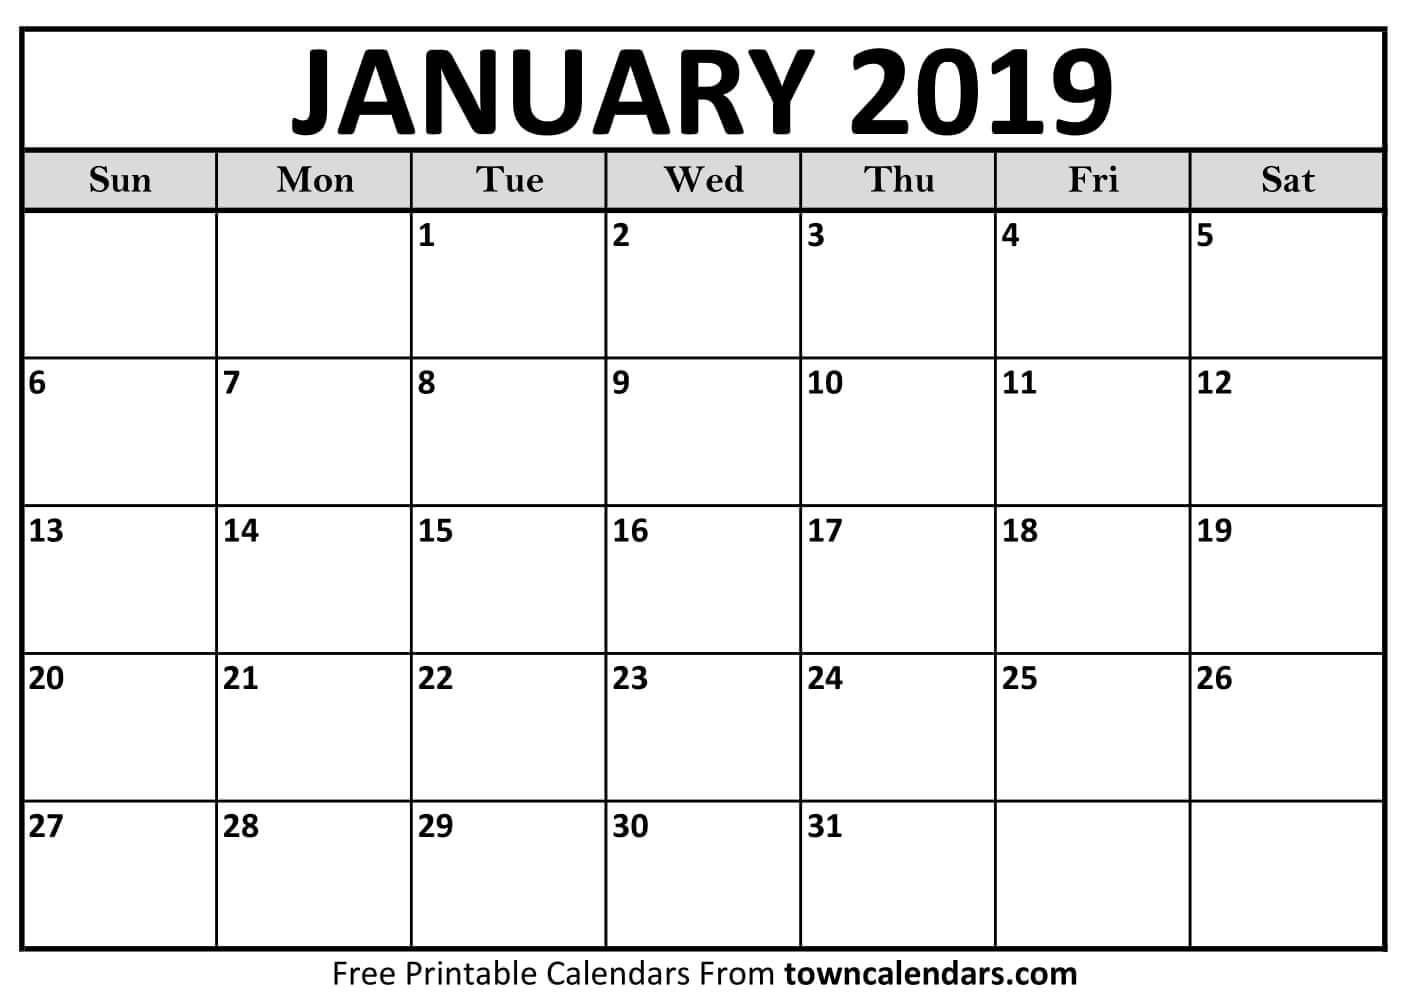 2019 Calendar Printable - Towncalendars